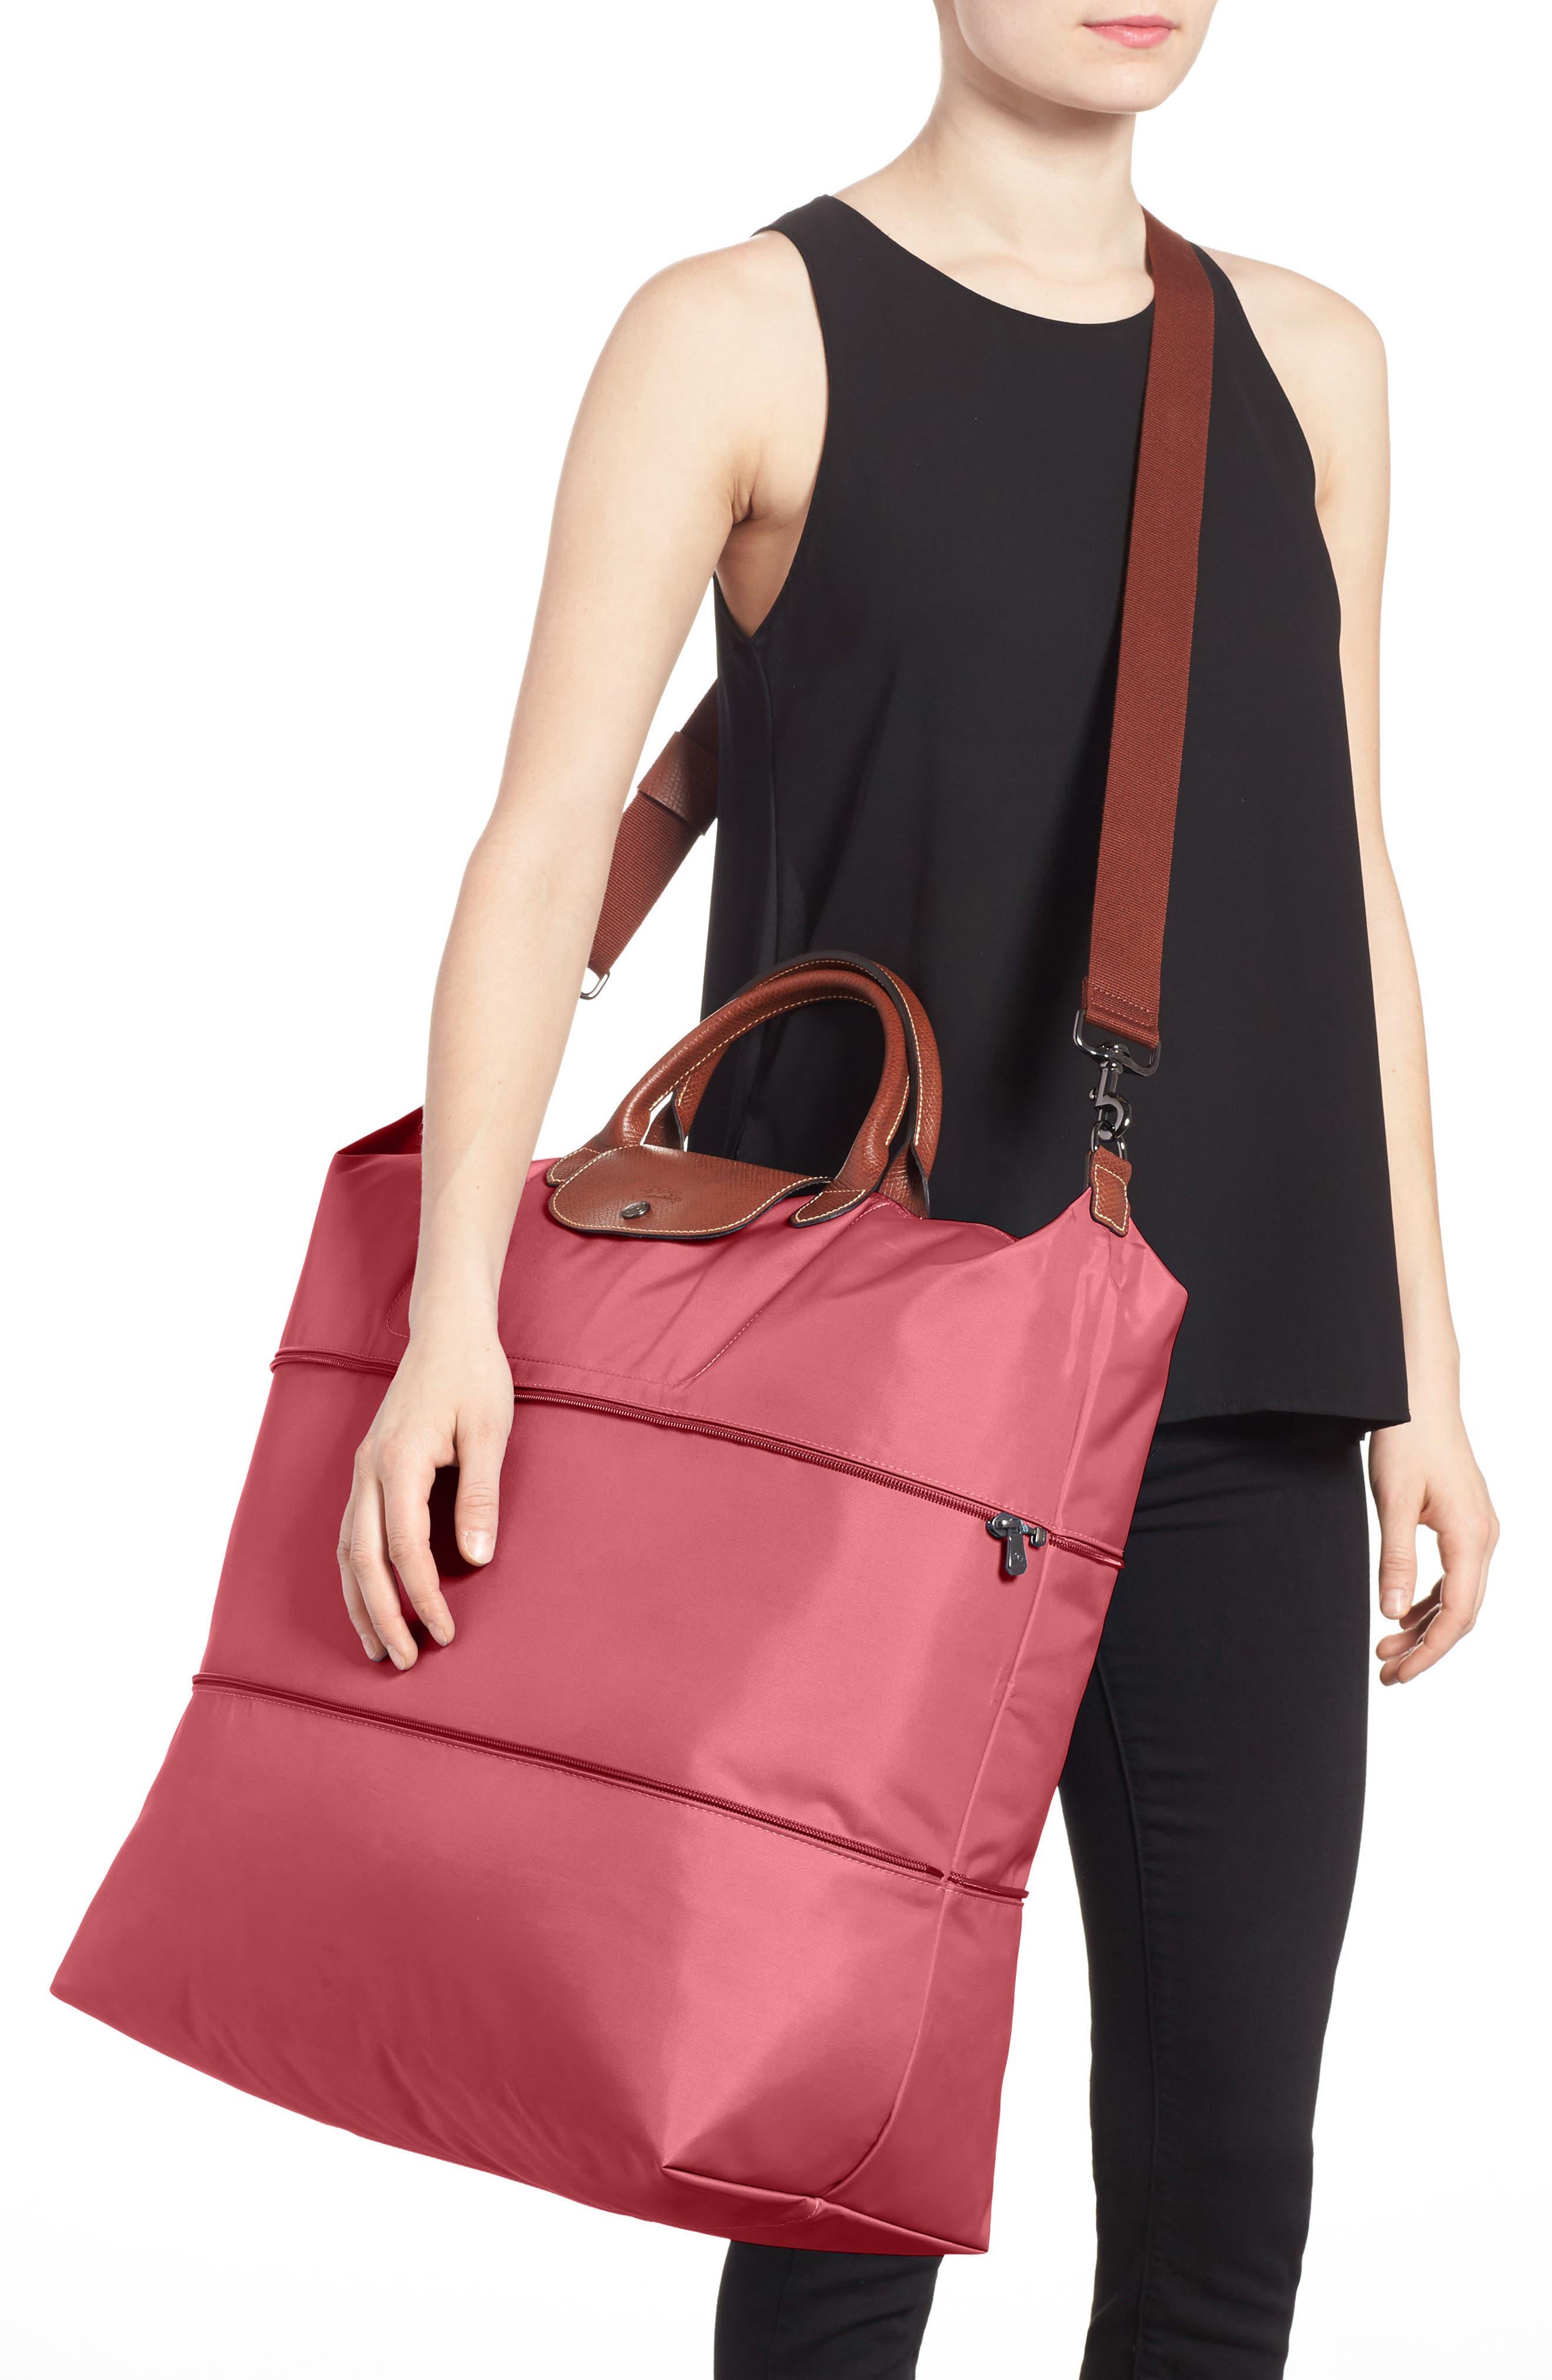 Le Pliage 21-Inch Expandable Travel Bag,                             Alternate thumbnail 2, color,                             FIG